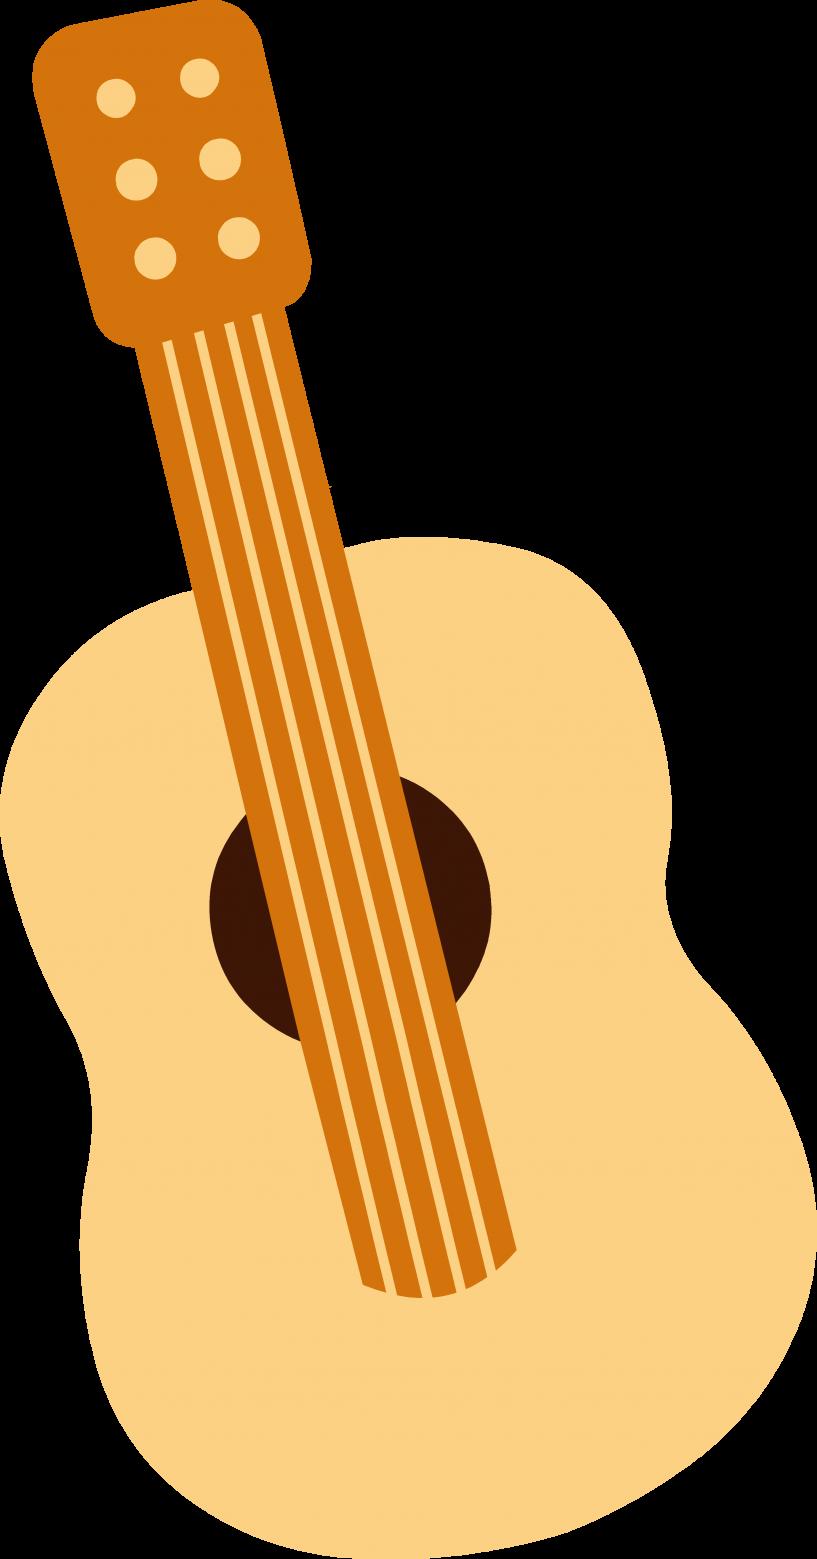 image royalty free download Mini toy free jokingart. Guitar clipart cute